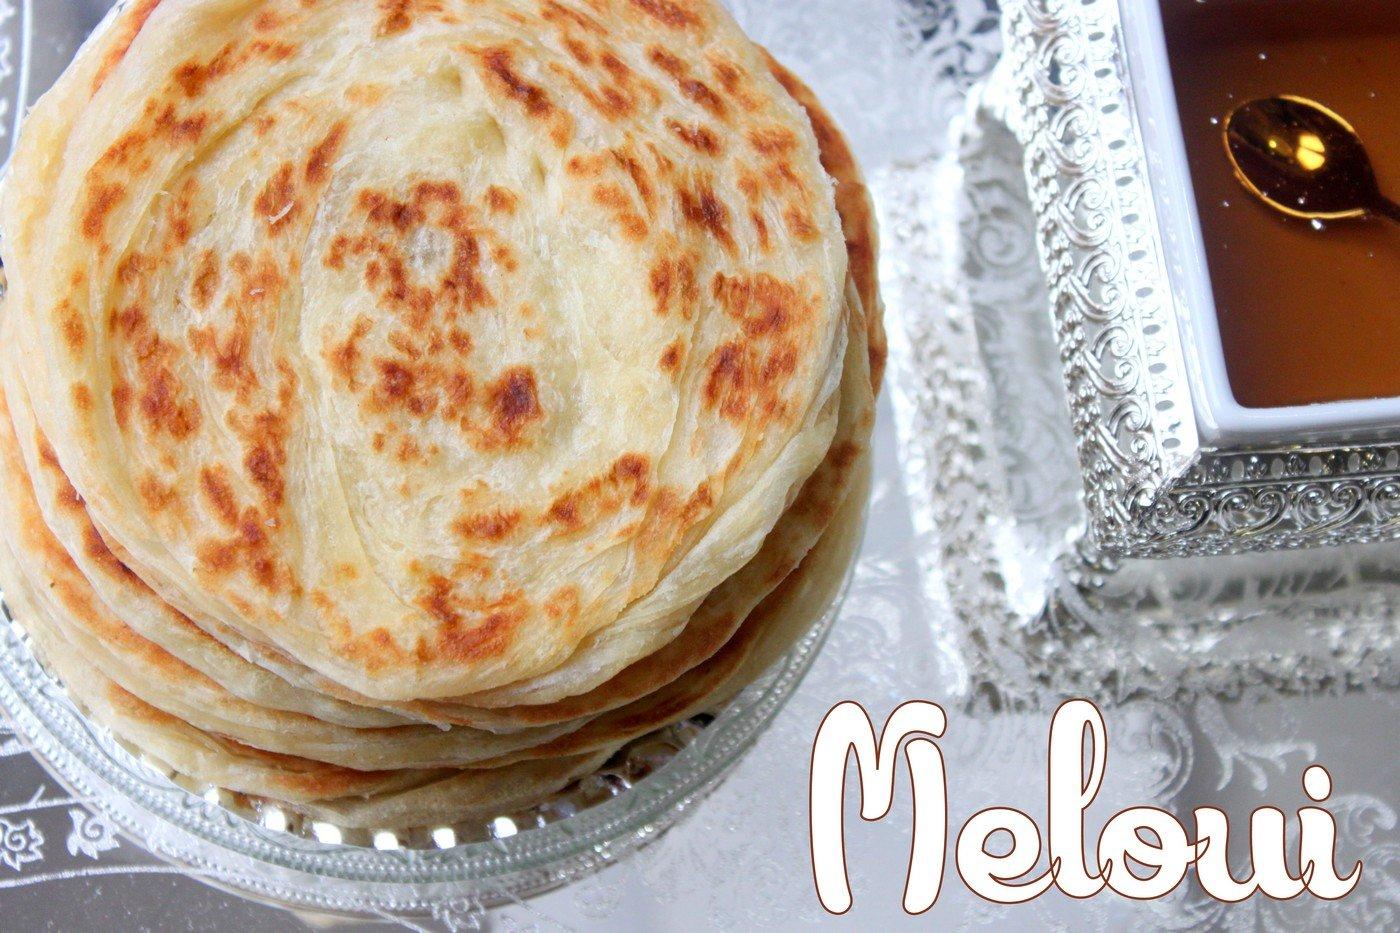 meloui, rghaif, des crêpes rondes marocaines